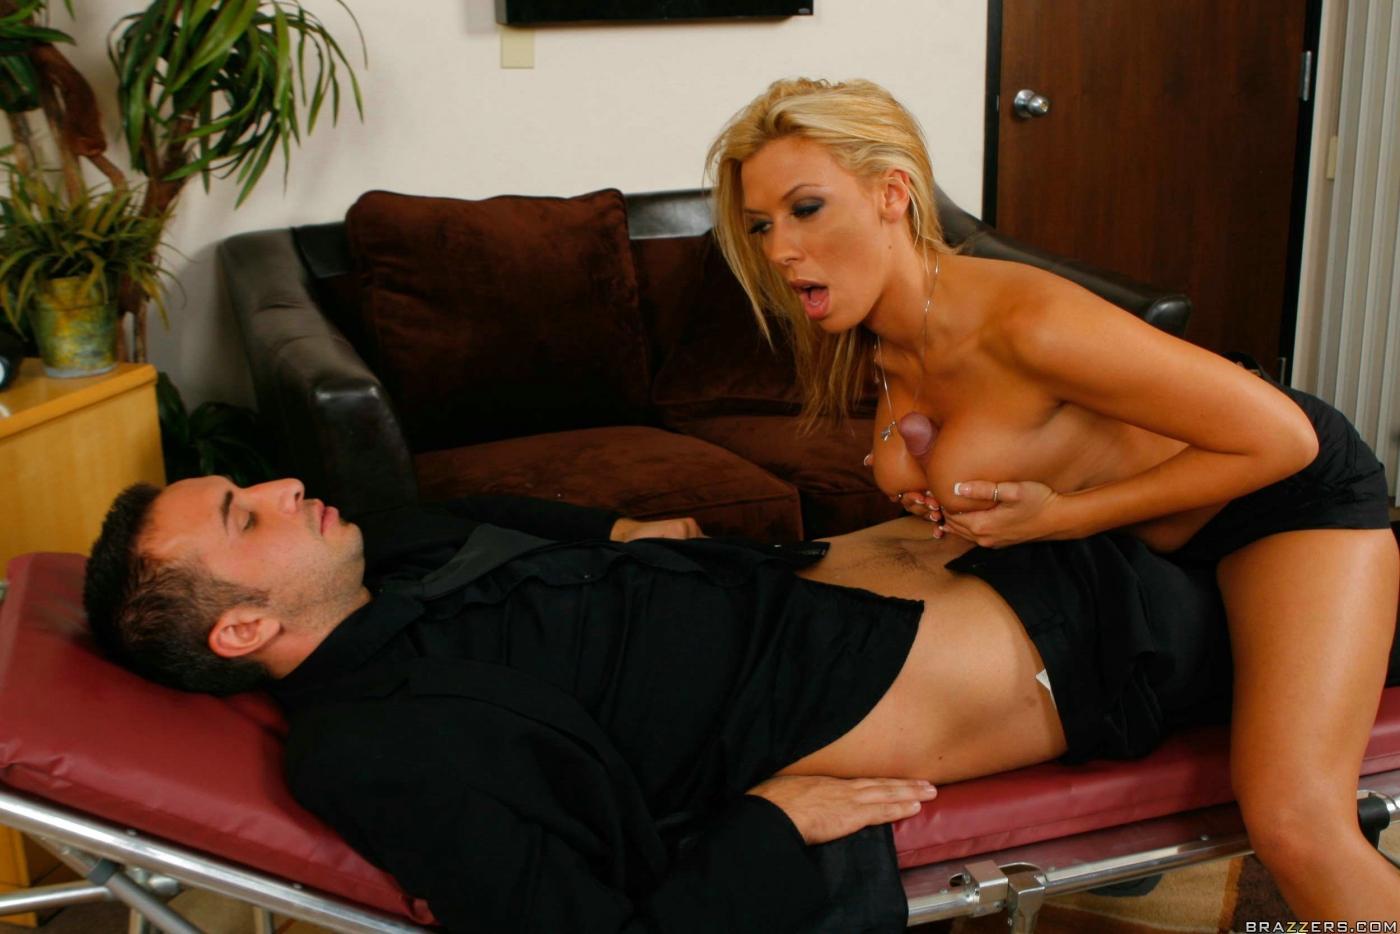 Рот порно фото в униформе врача